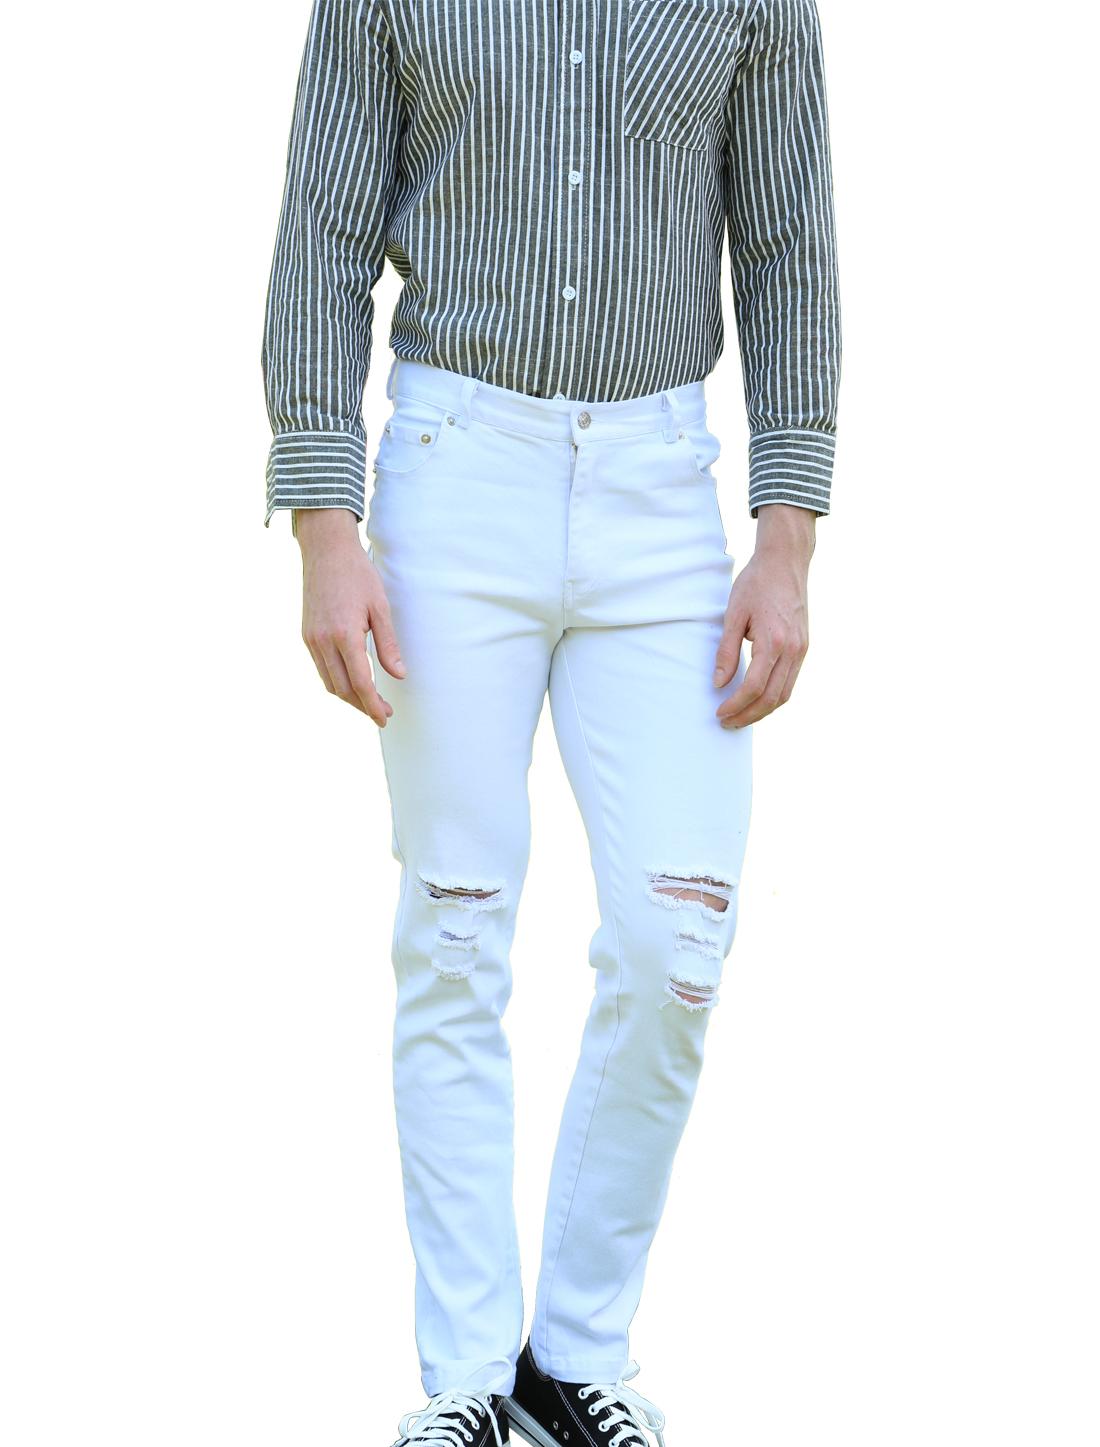 Men Knee Ripped Detail Distressed Slim Fit Jeans Denim Pants White W30